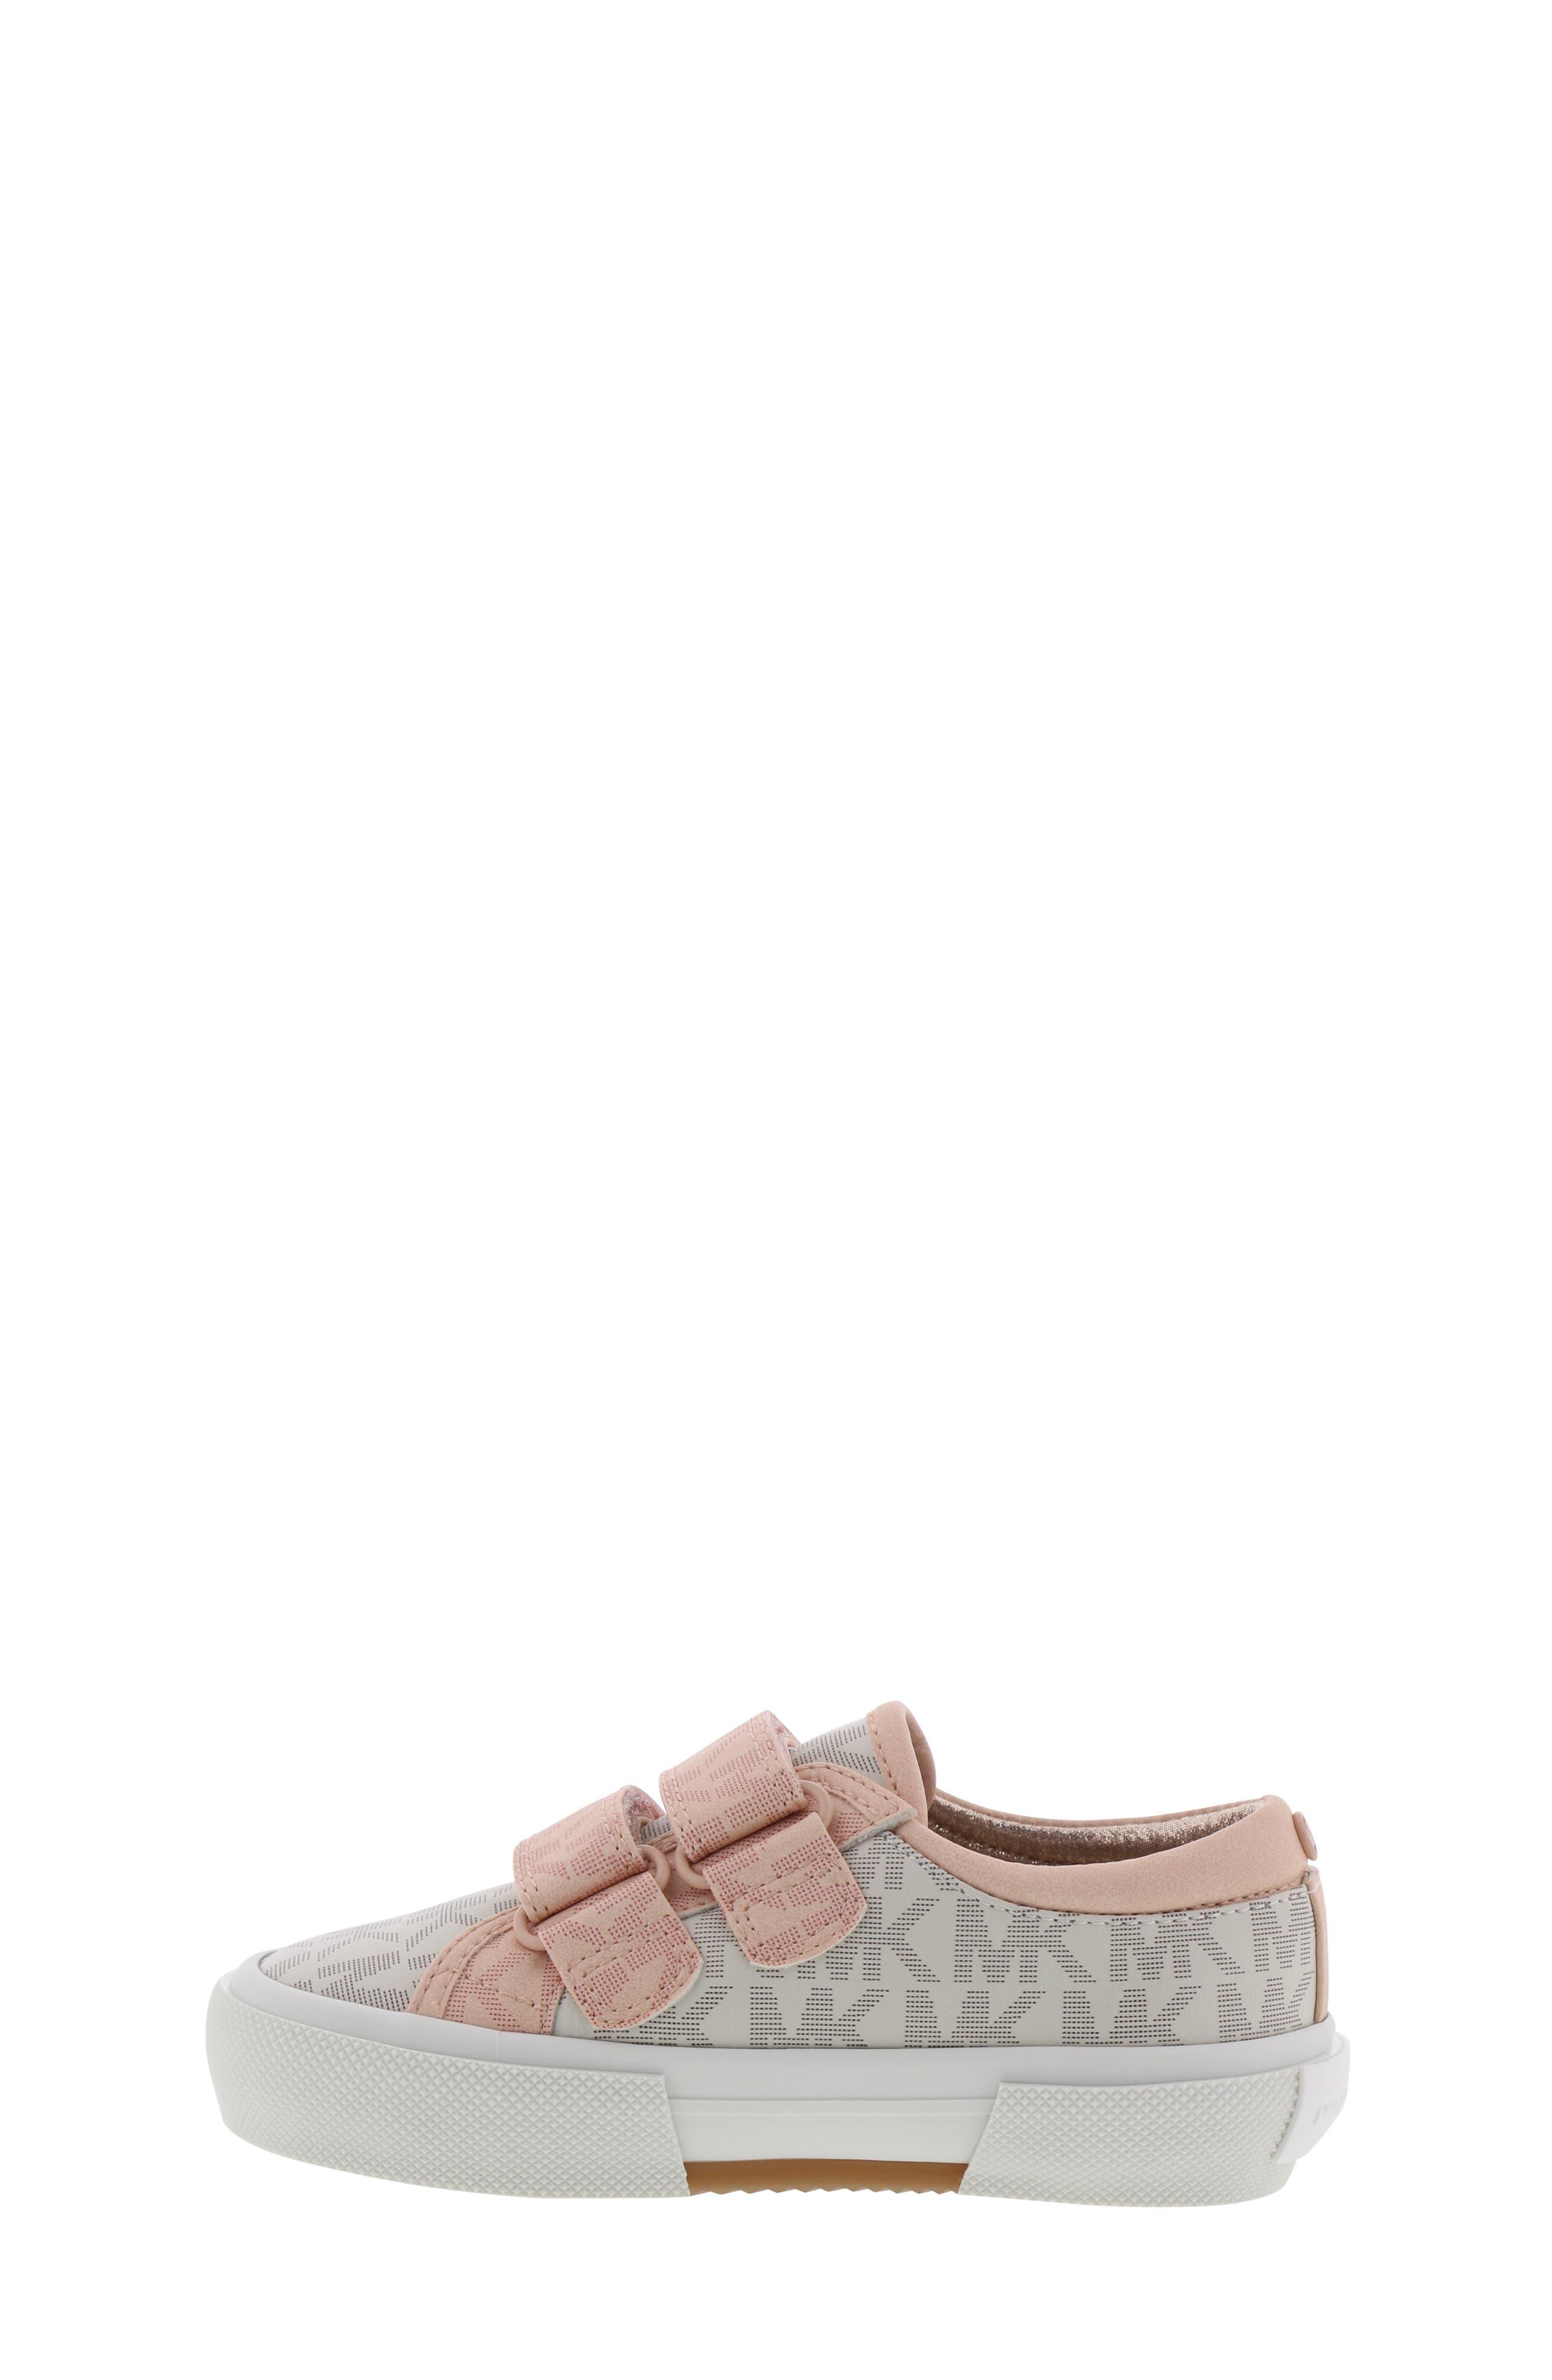 Ima Double Platform Sneaker,                             Alternate thumbnail 8, color,                             VANILLA/ BLUSH